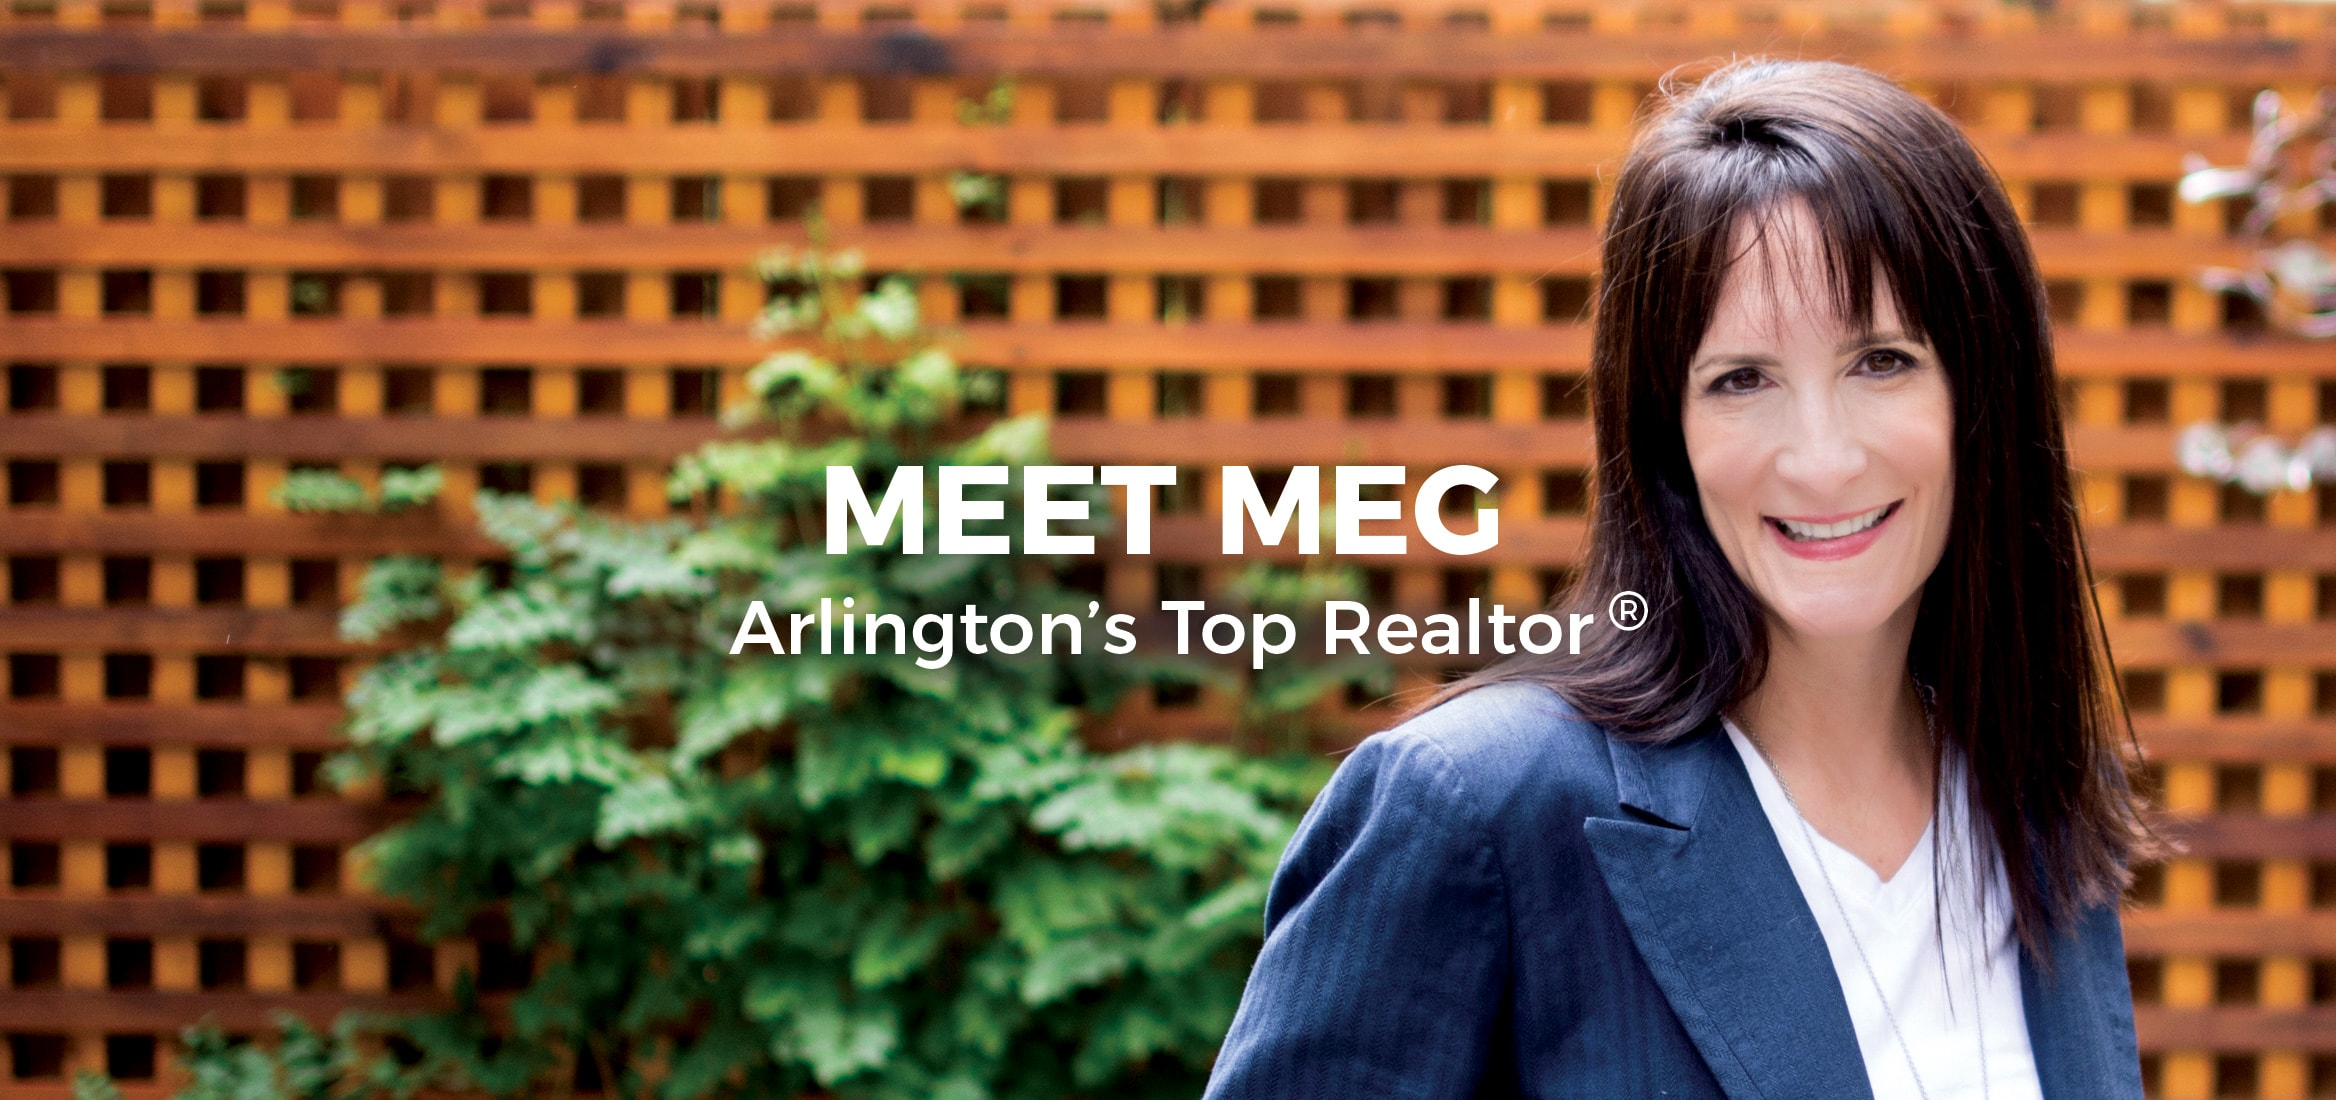 Meet Meg Ross top Arlington realtor